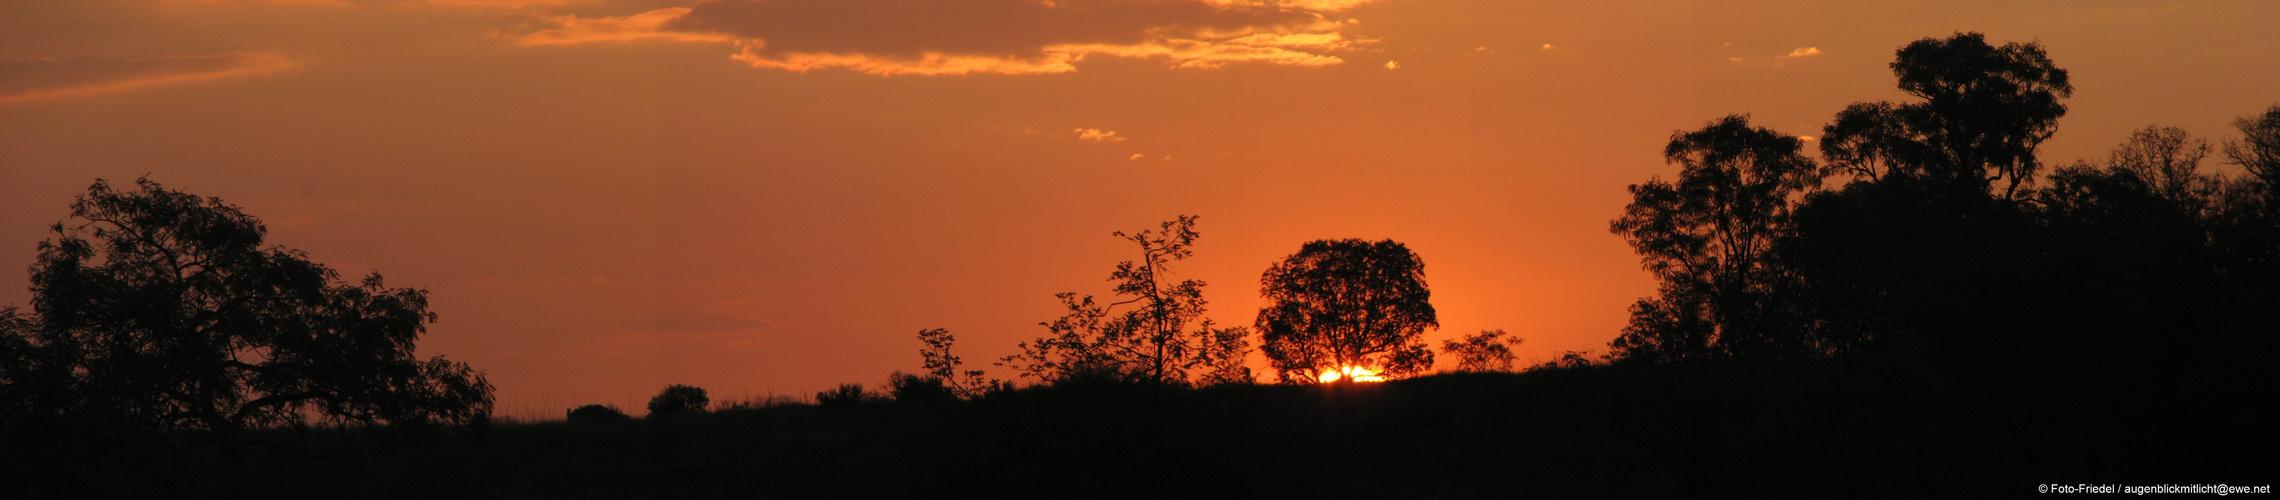 Sonnenuntergang in Renosterpoort